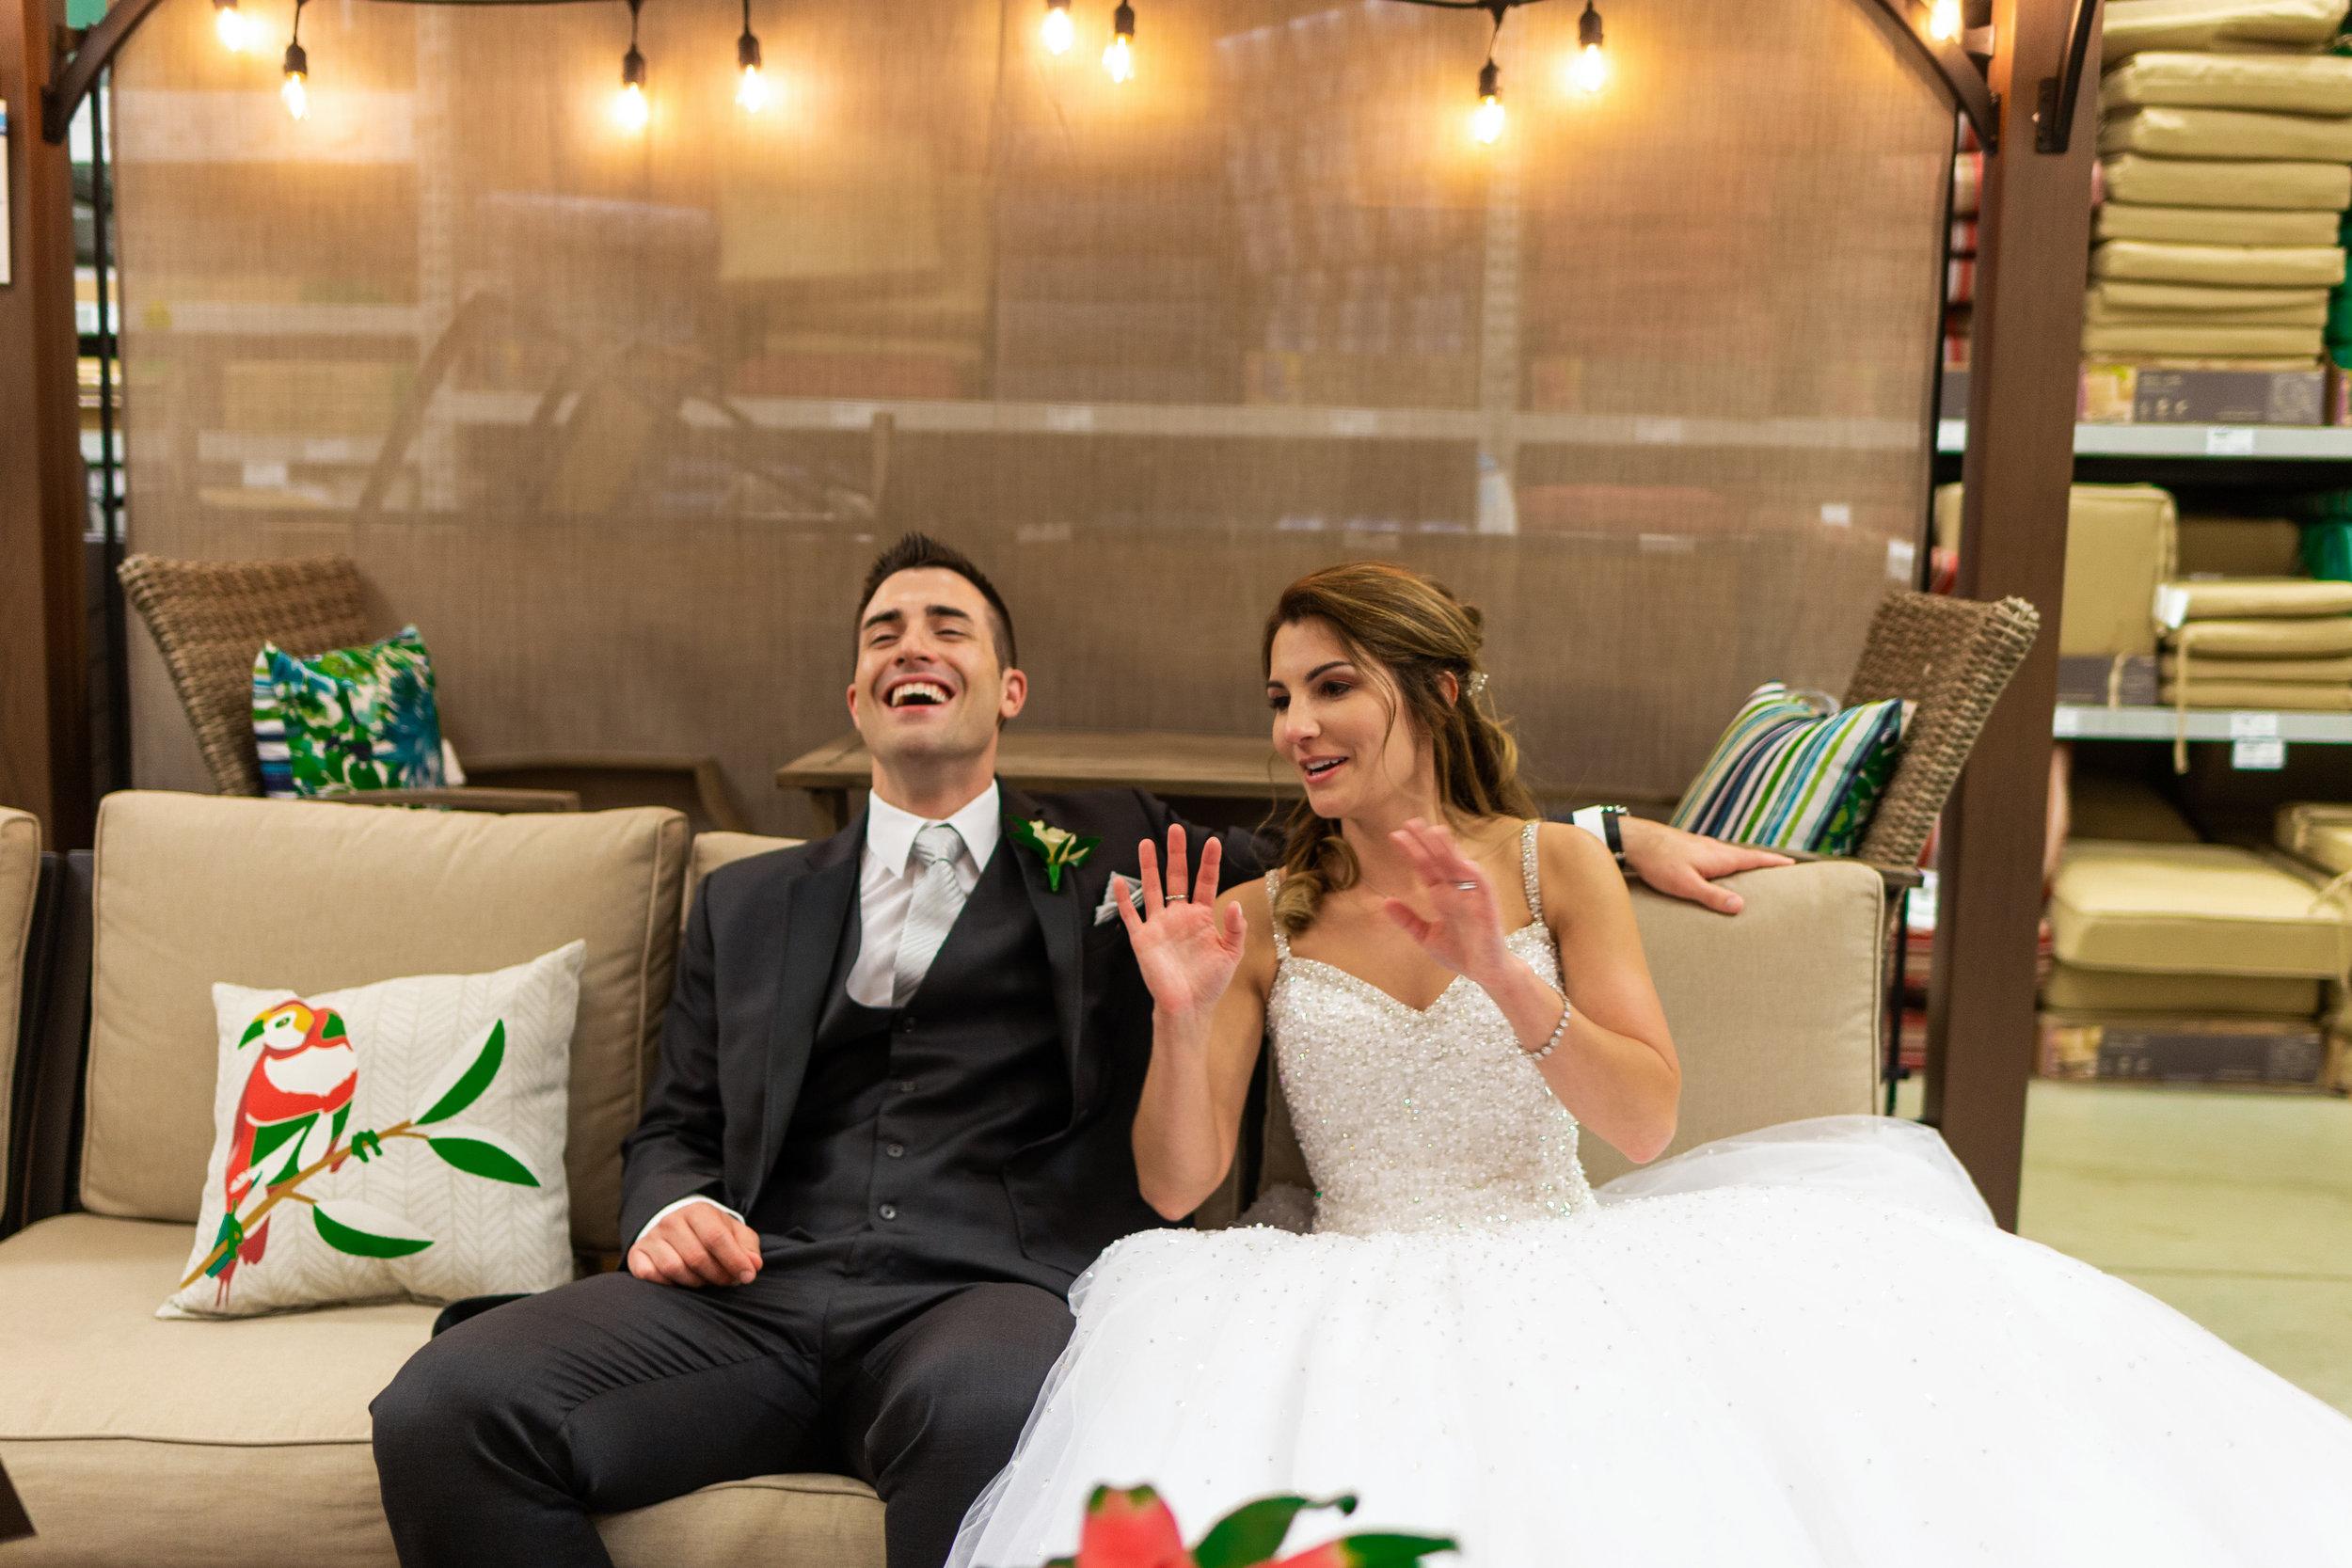 Wedding-couple-takes-photos-at-lowes-hardware-due-to-rain19.jpg